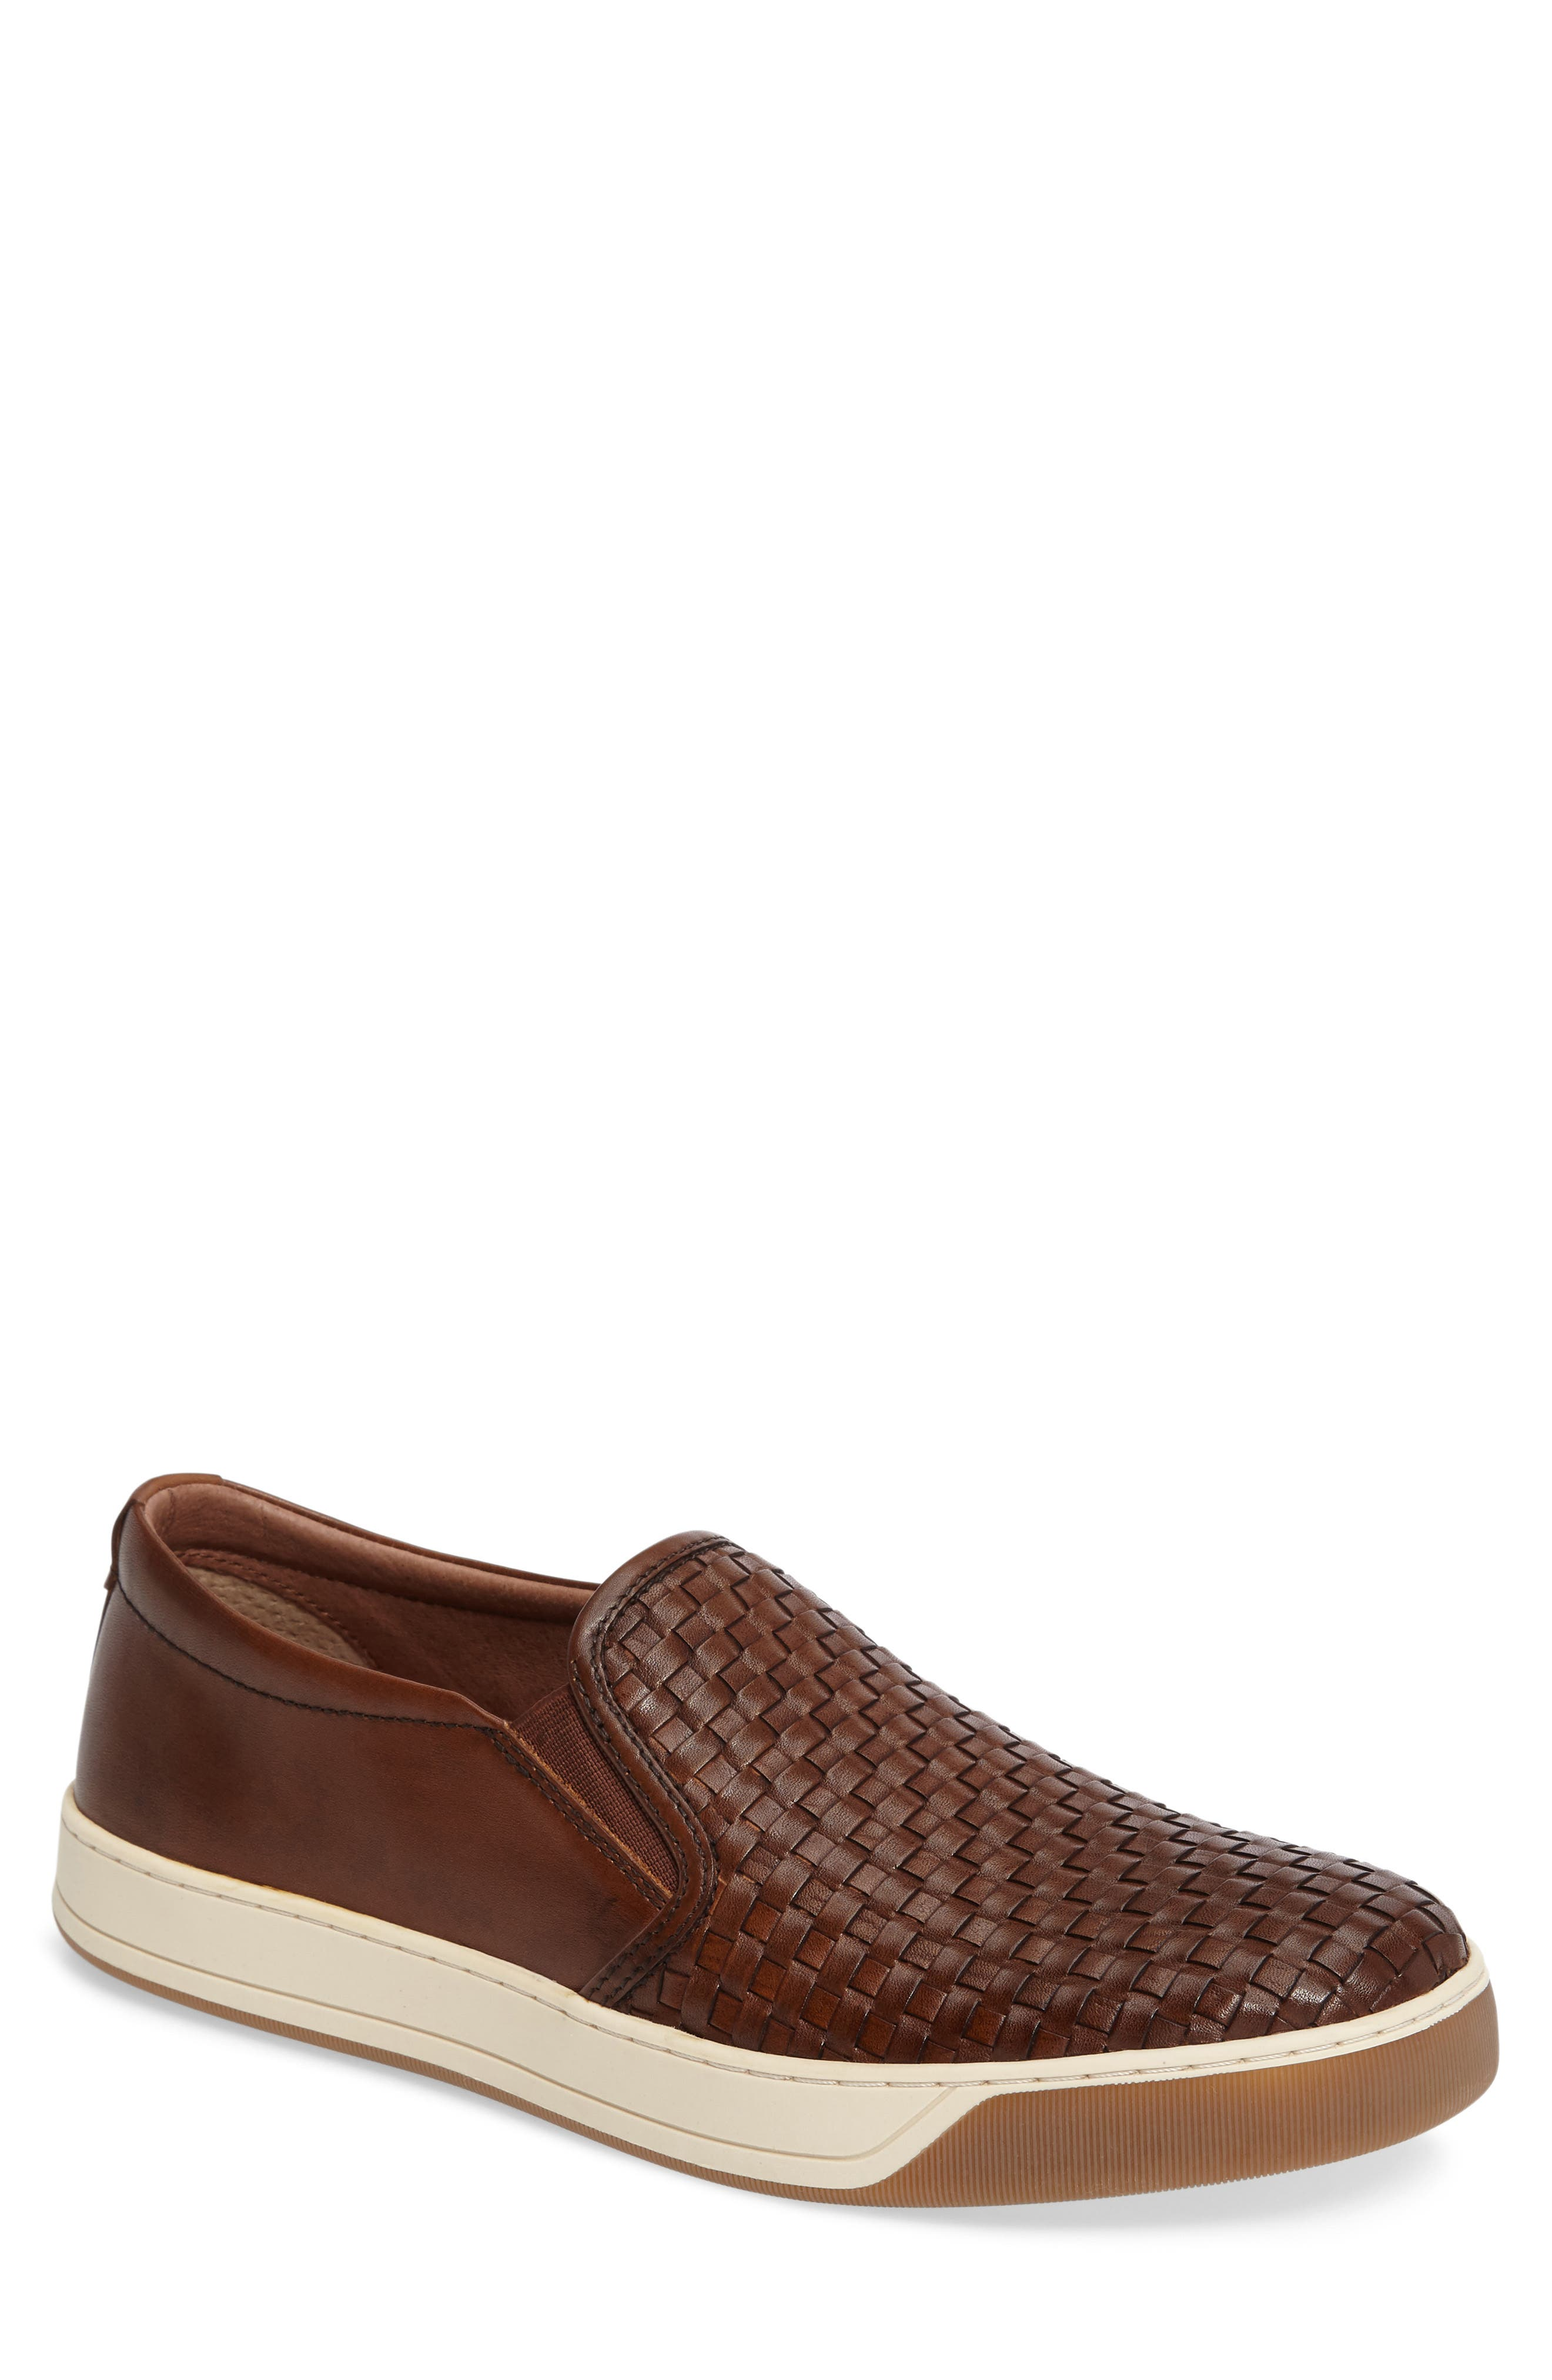 Allister Slip-On Sneaker, Main, color, TAN LEATHER